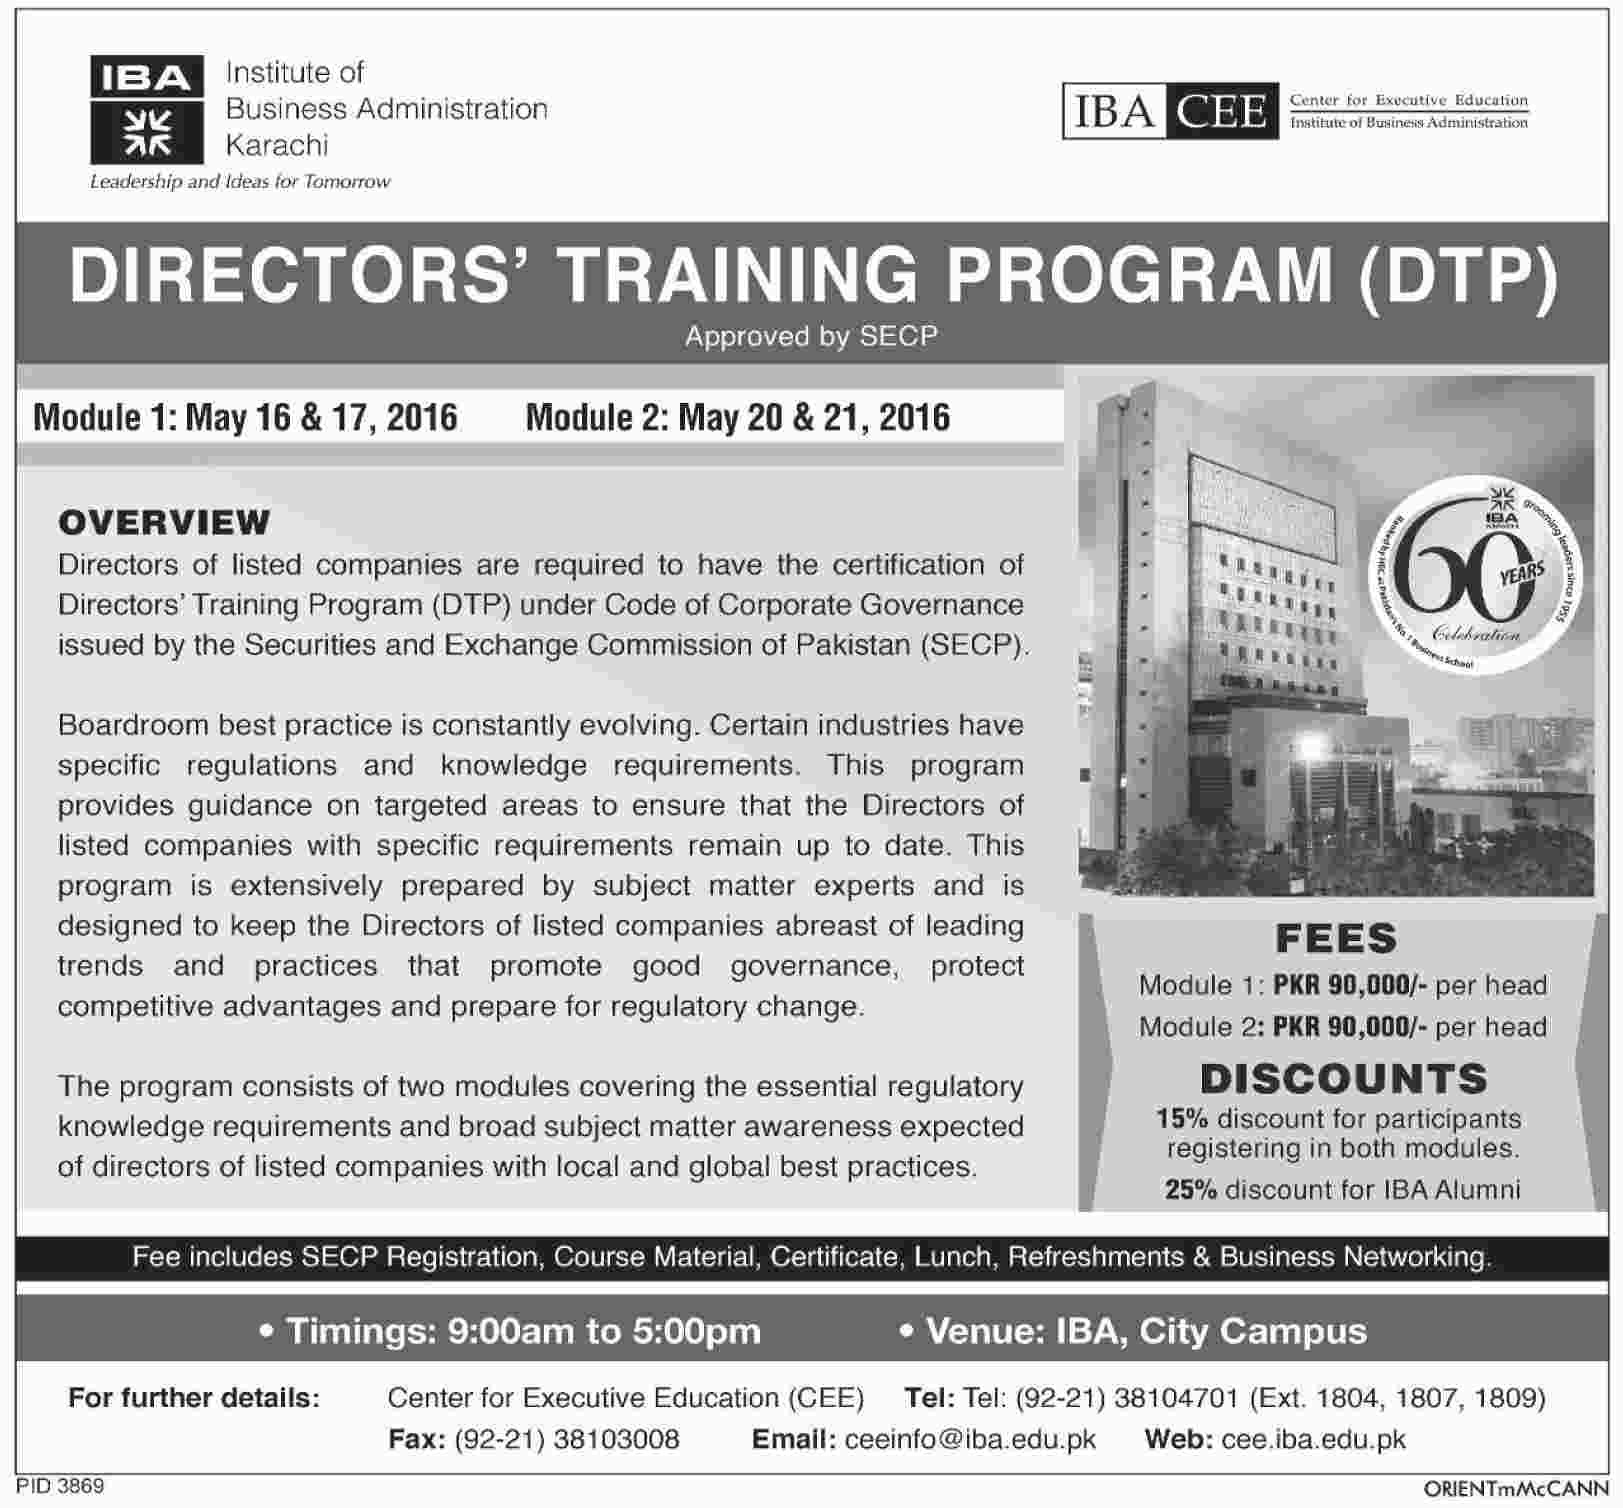 IBA Karachi Directors Training Program 2016